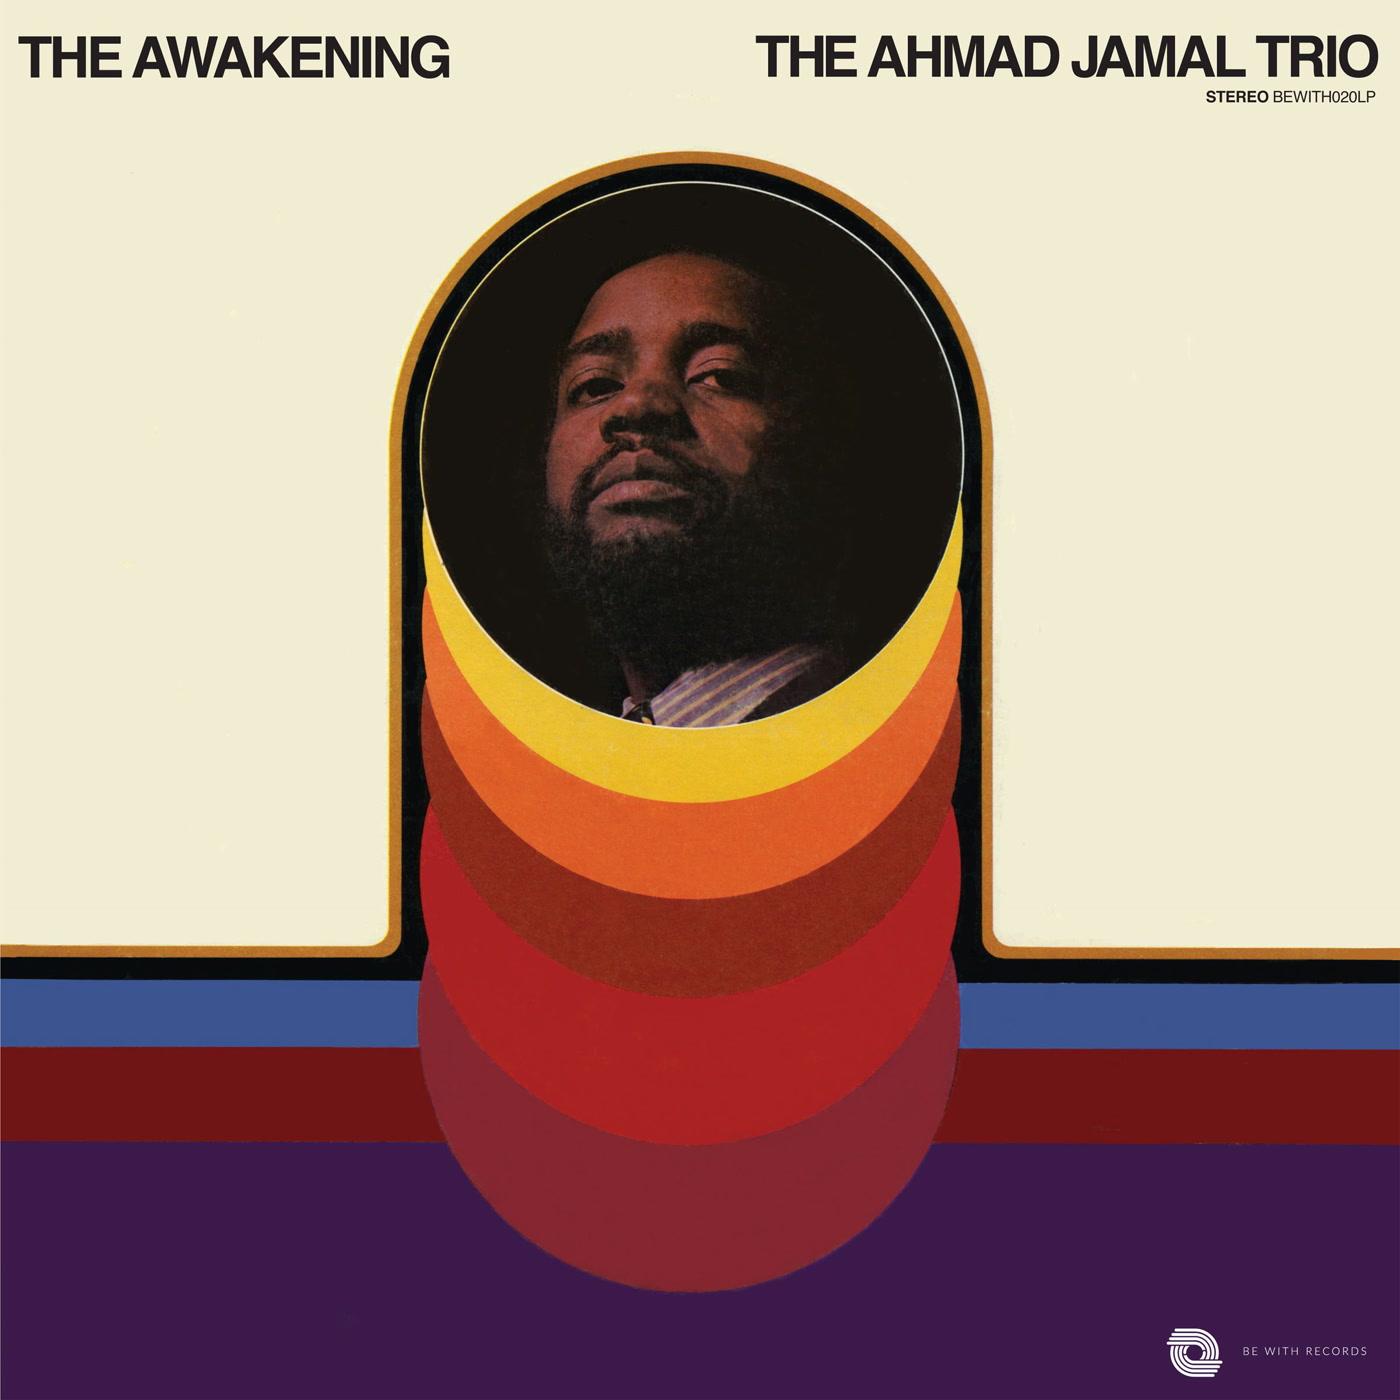 Be With Records выпустят переиздание культовой пластинки Ахмада Джамала The Awakening